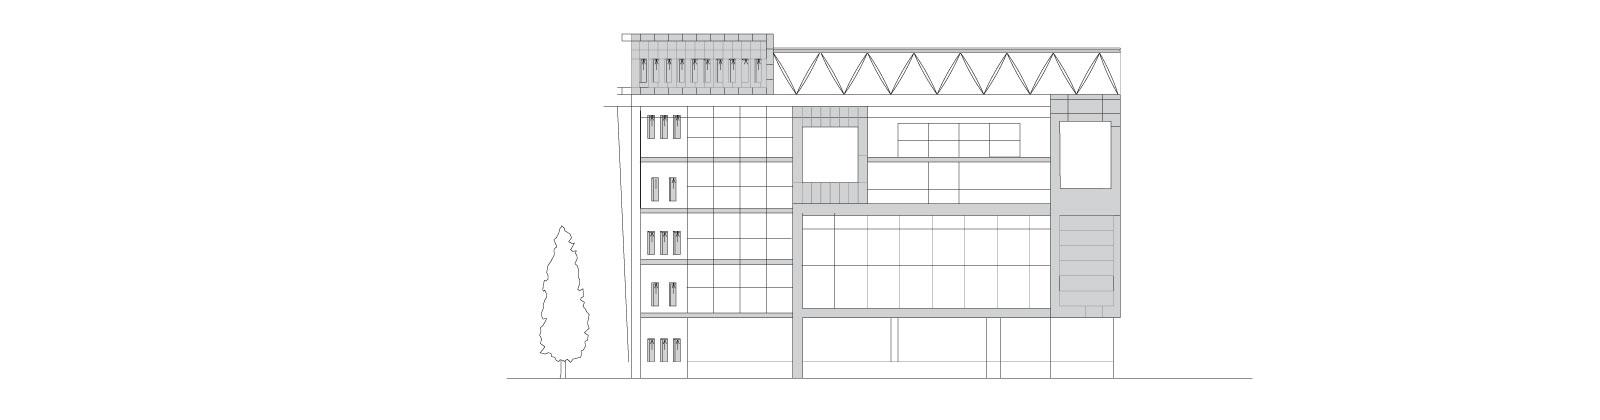 Sri Sai Constructions - Before Image